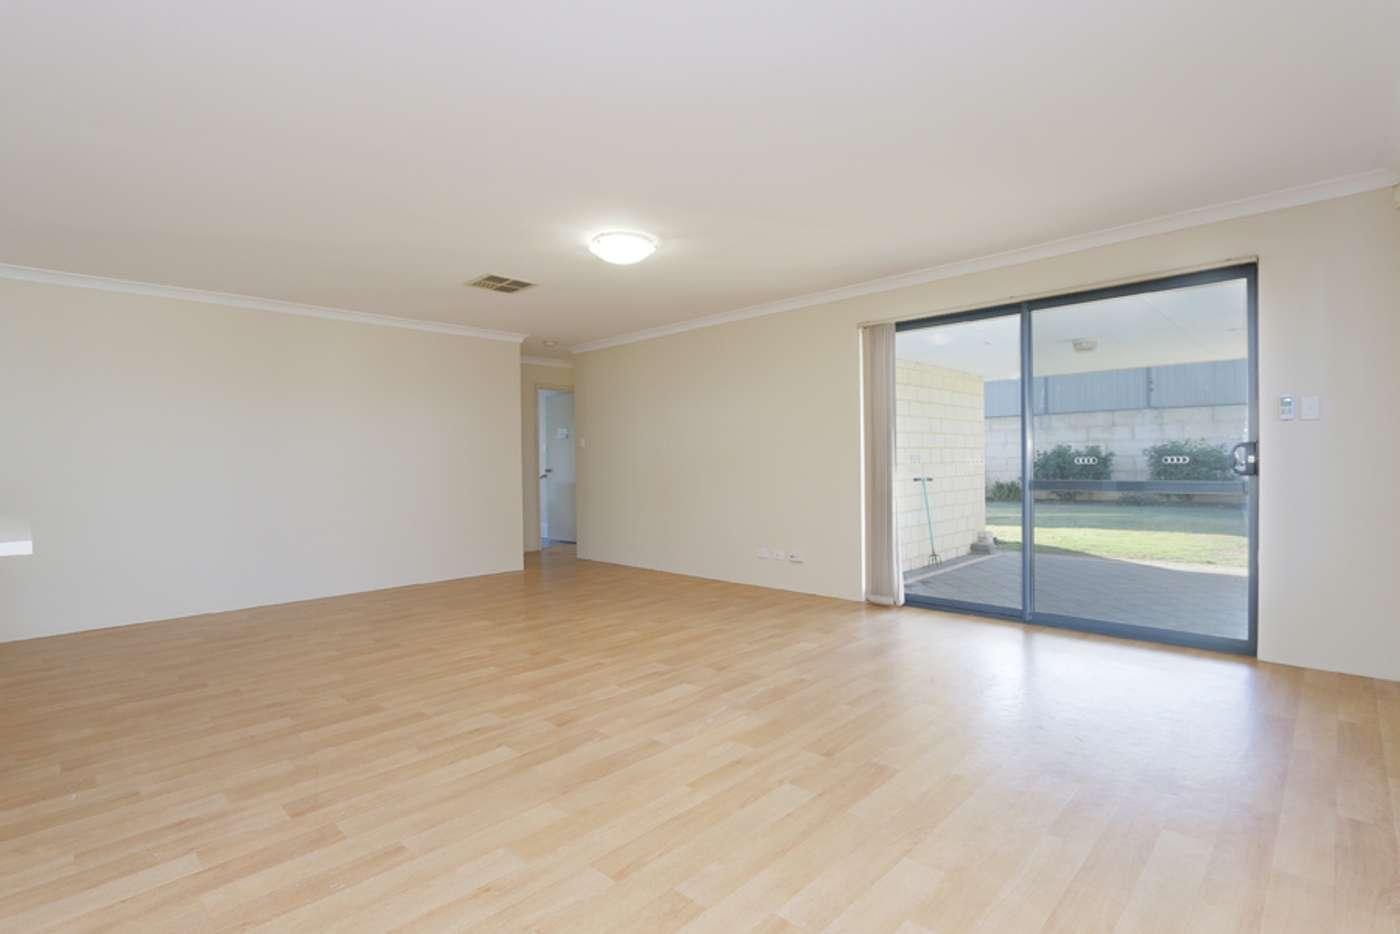 Sixth view of Homely house listing, 9 Wodonga Court, Baldivis WA 6171